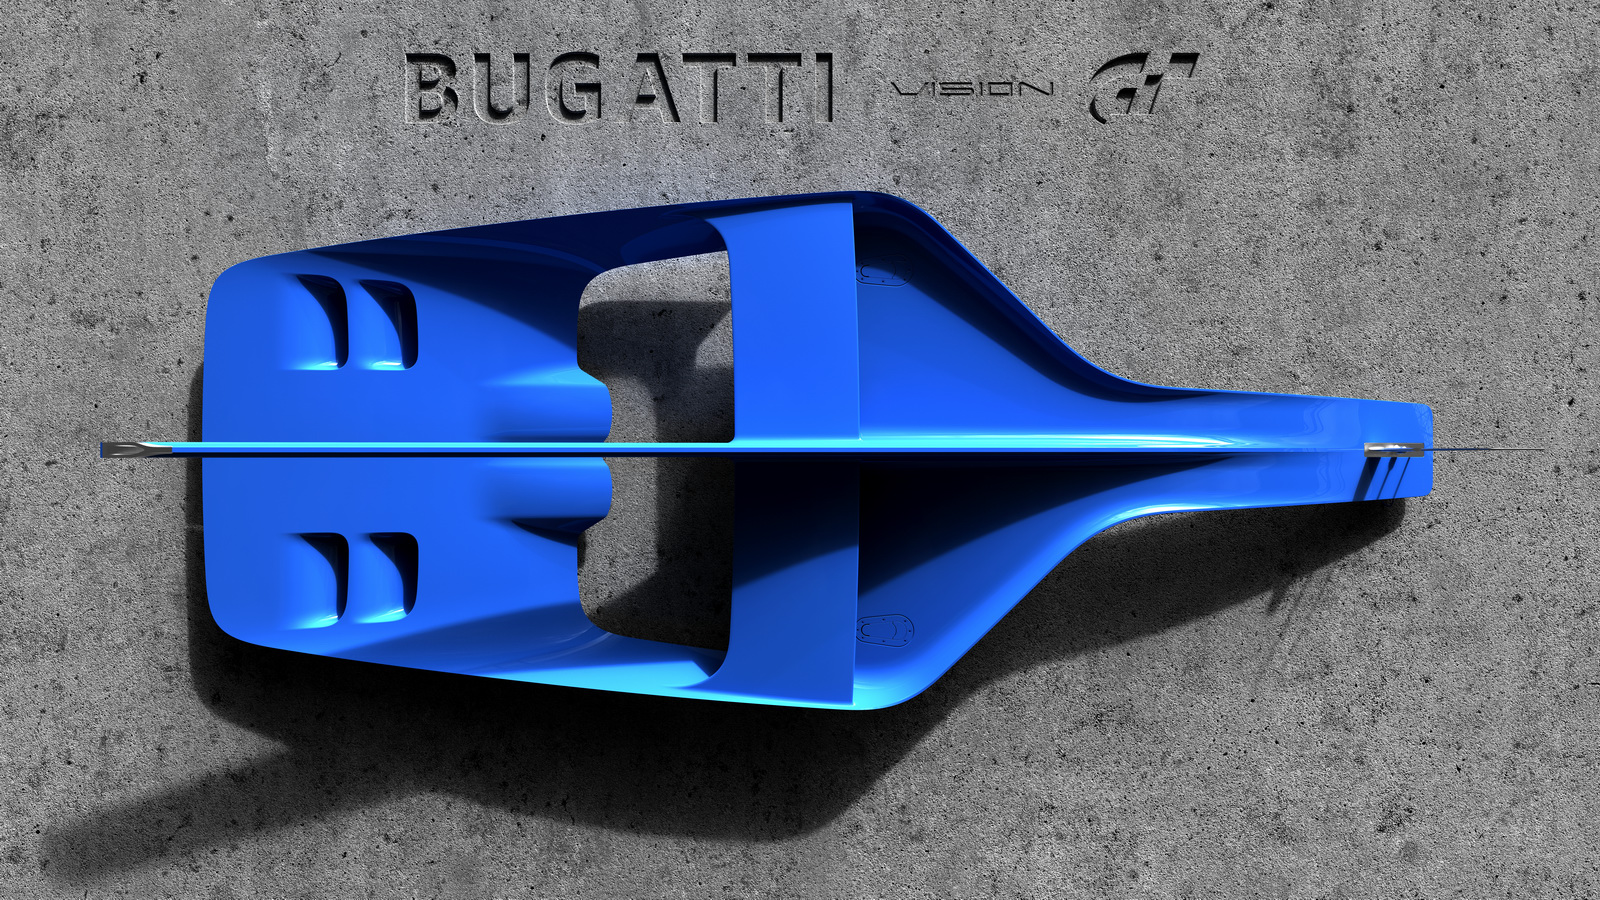 bugatti officially teases vision gran turismo concept - gtspirit